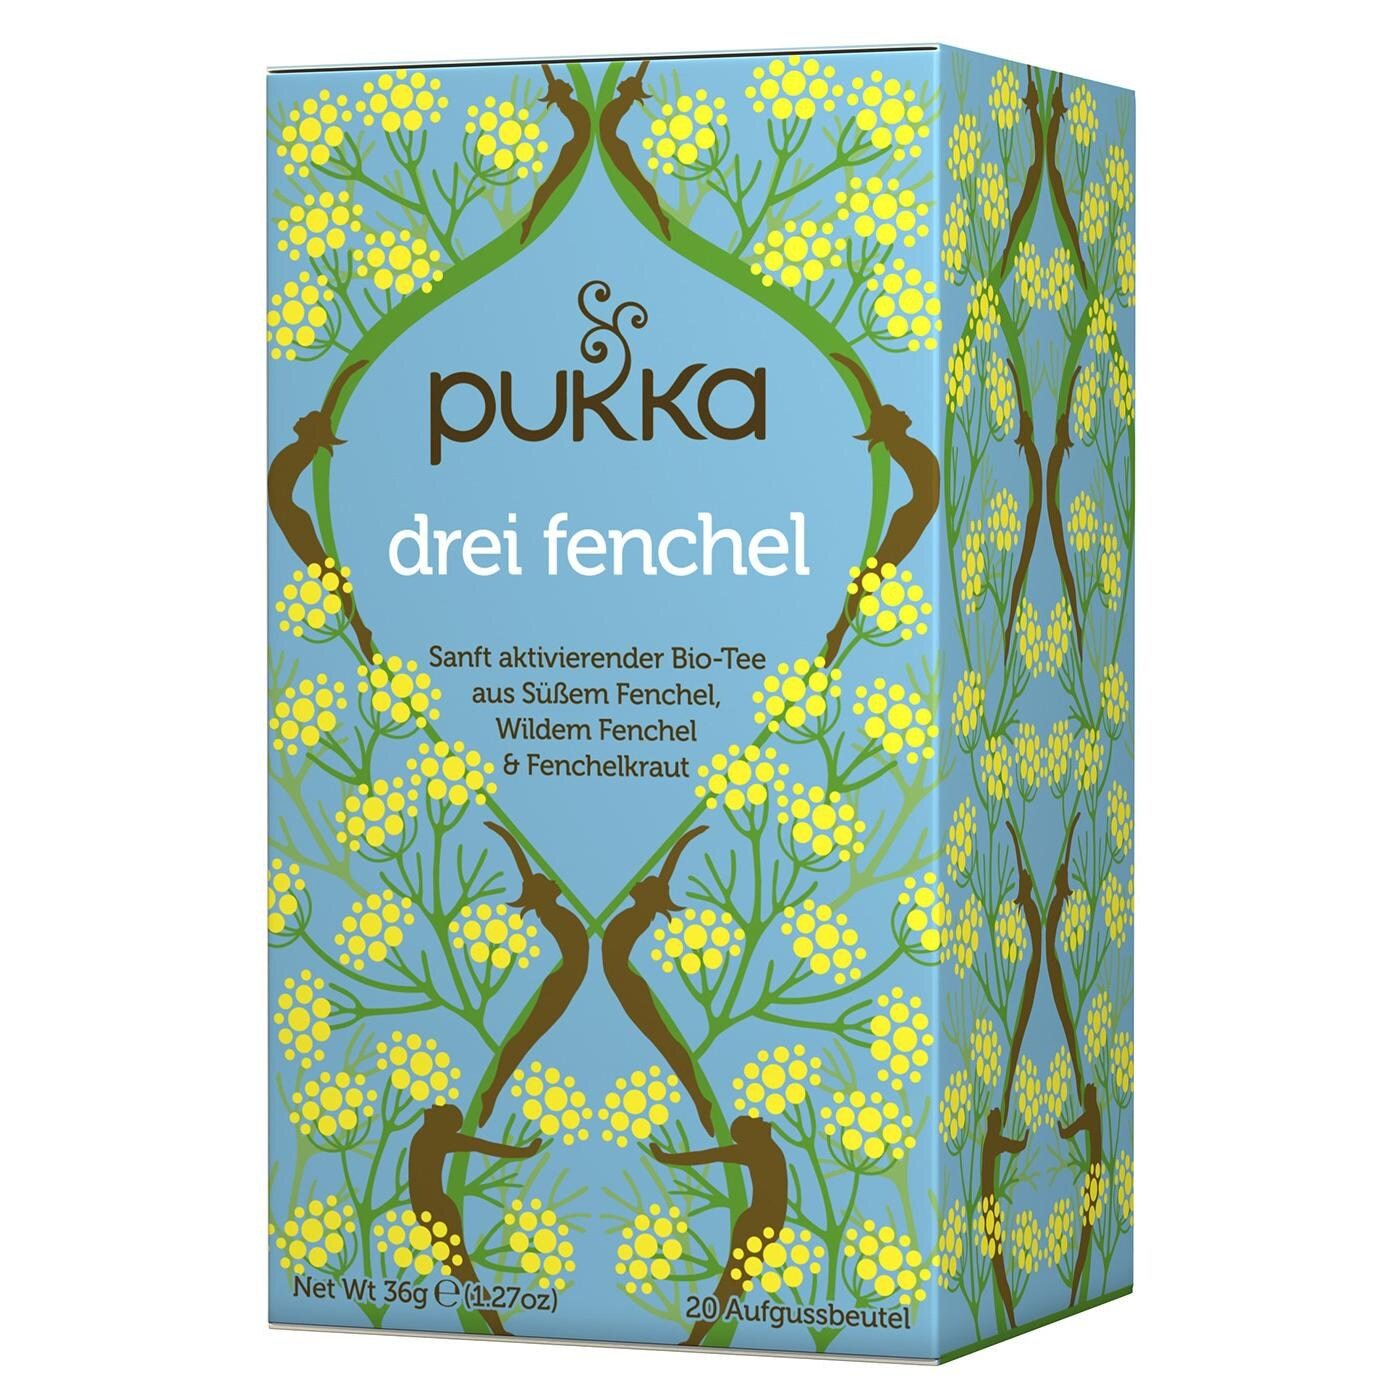 Pukka Herbs Bio Drei Fenchel Teemischung 36g